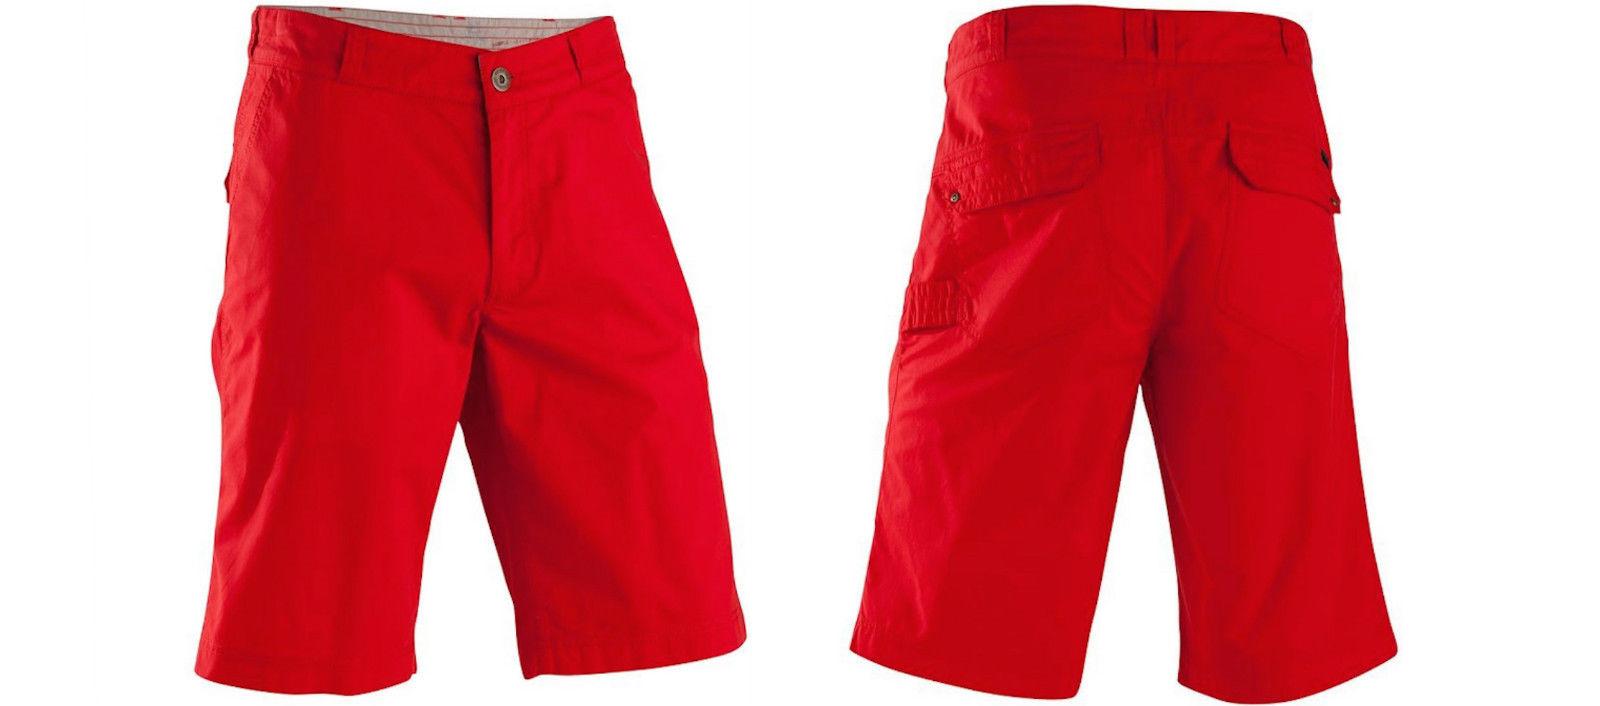 Exclusive Unisex Shorts Bermudas Sporthose Wanderhose, rot, Gr. 38-60